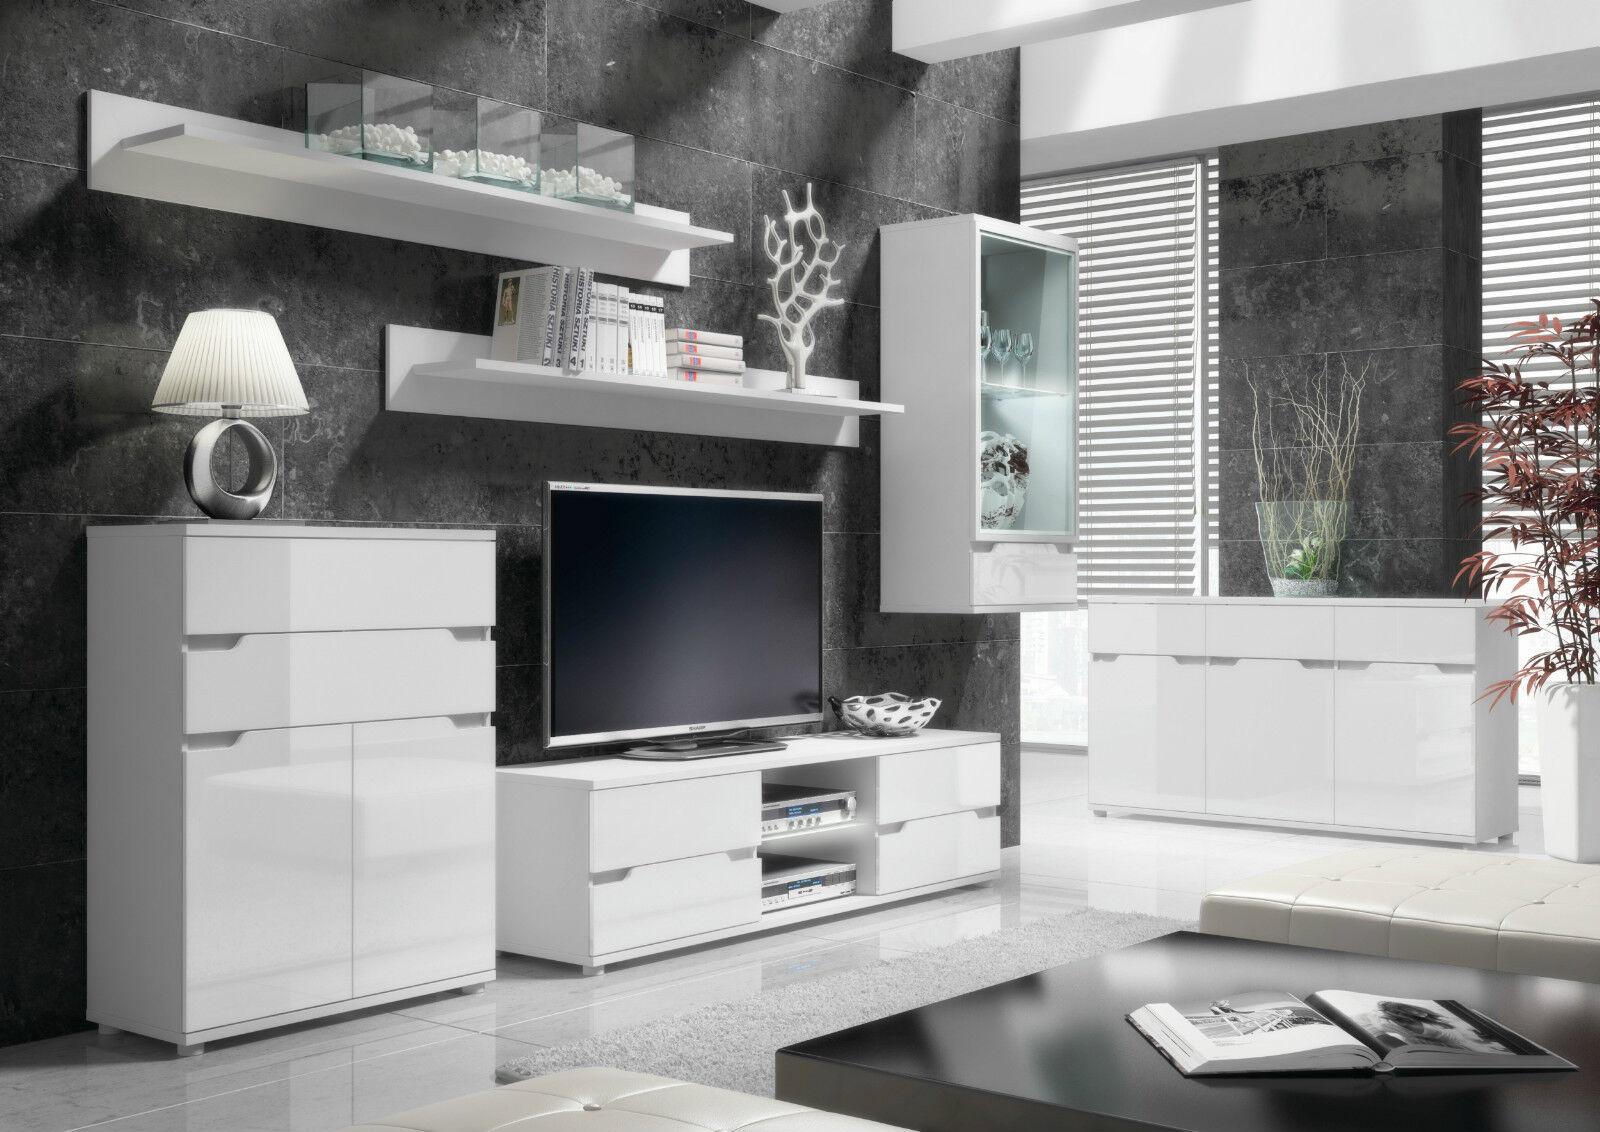 White High Gloss Living Room Furniture Uk White Gloss Furniture Living Room Aspire High Gloss White Lounge